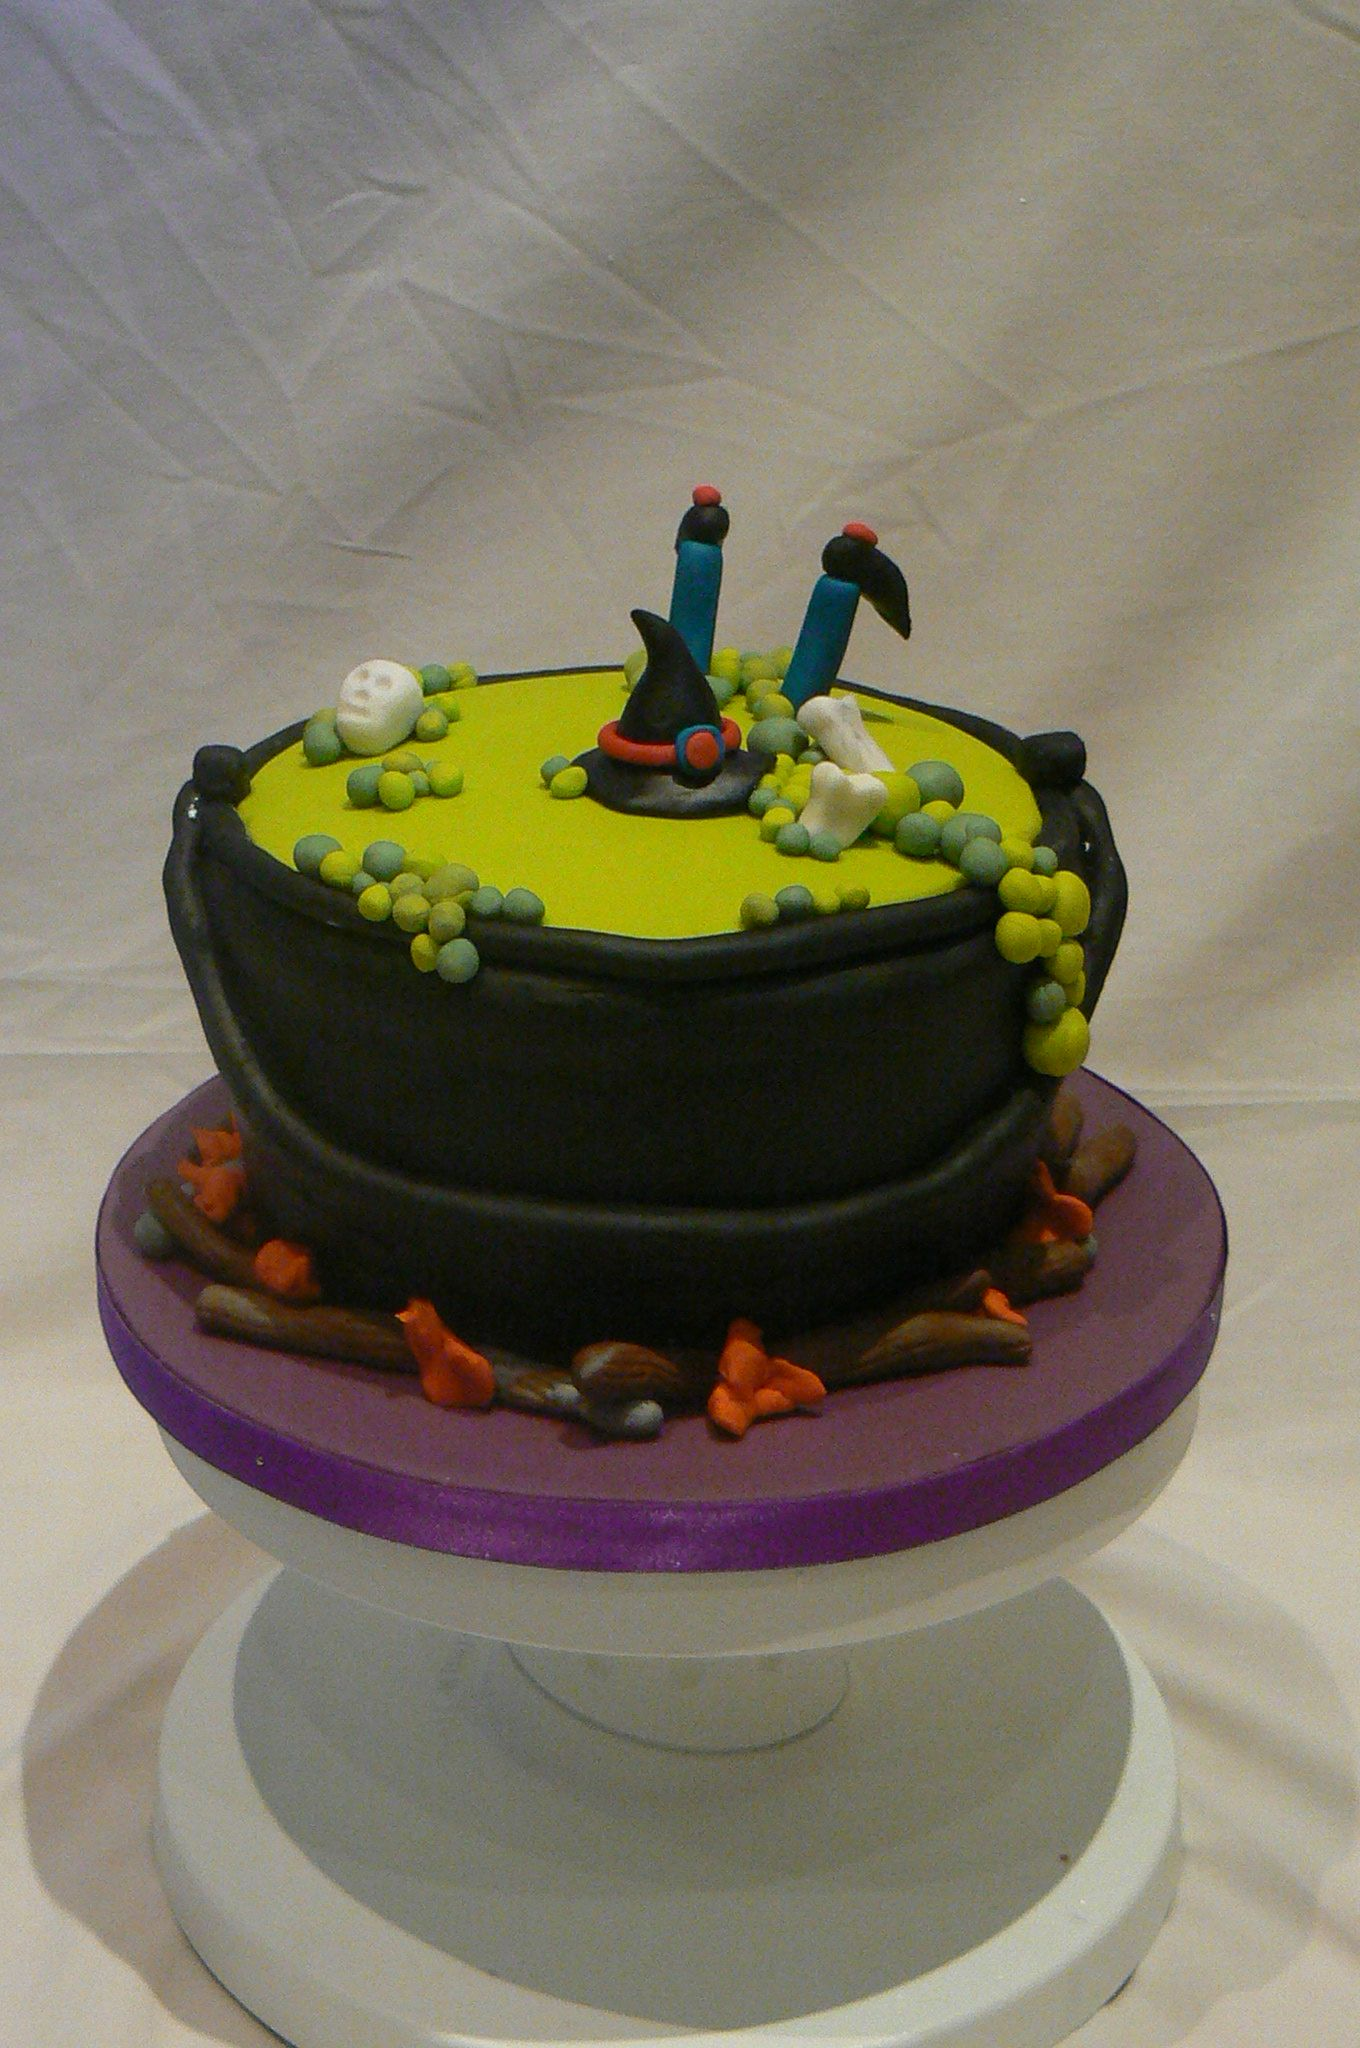 Homemade Halloween cake. Witch cake. Cauldron cake. Fun